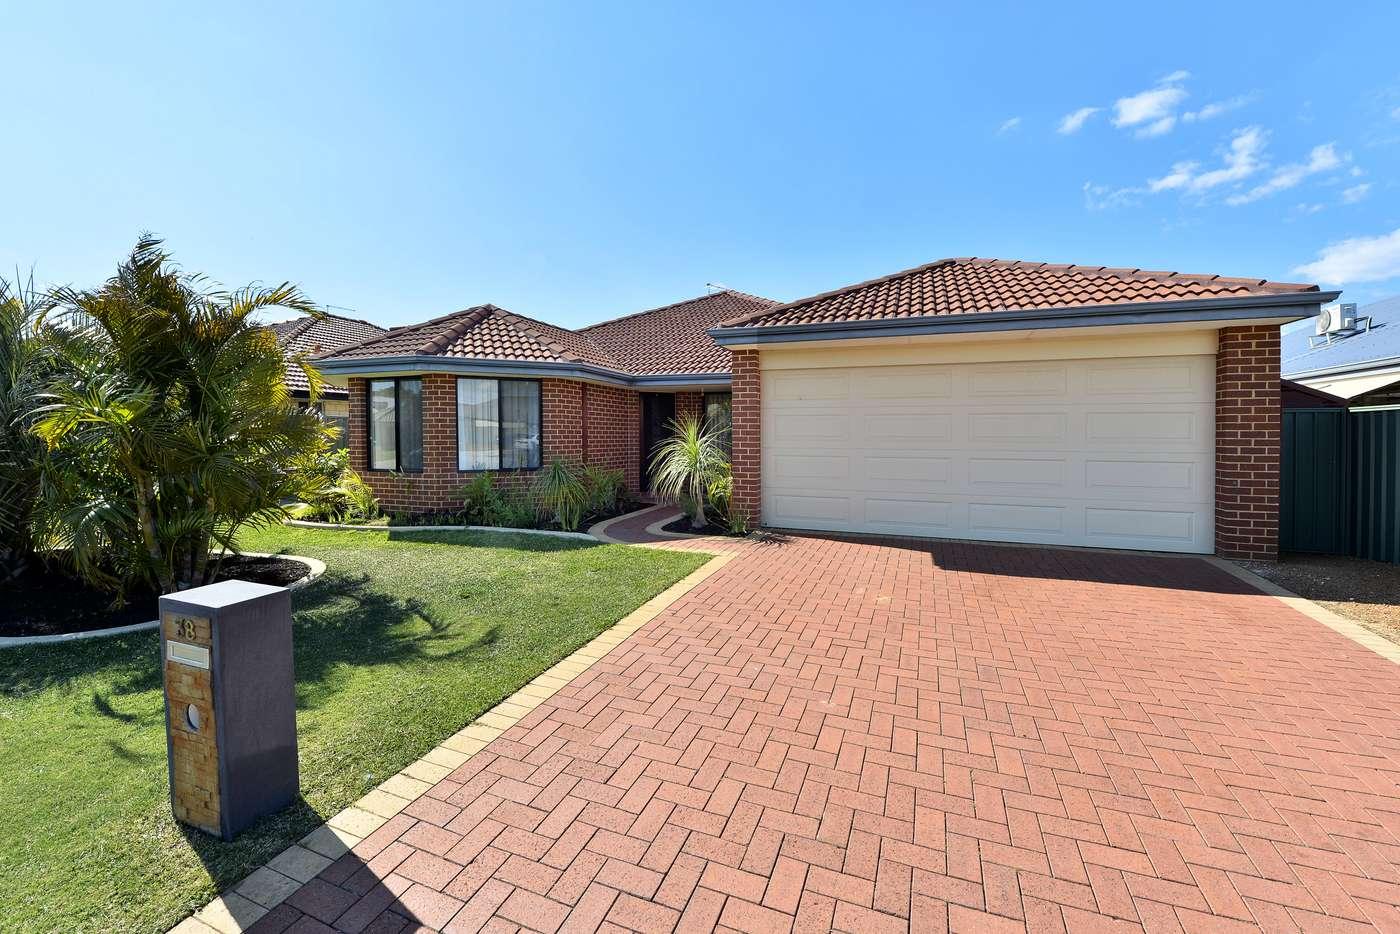 Main view of Homely house listing, 38 Goldseeker Loop, Ravenswood WA 6208